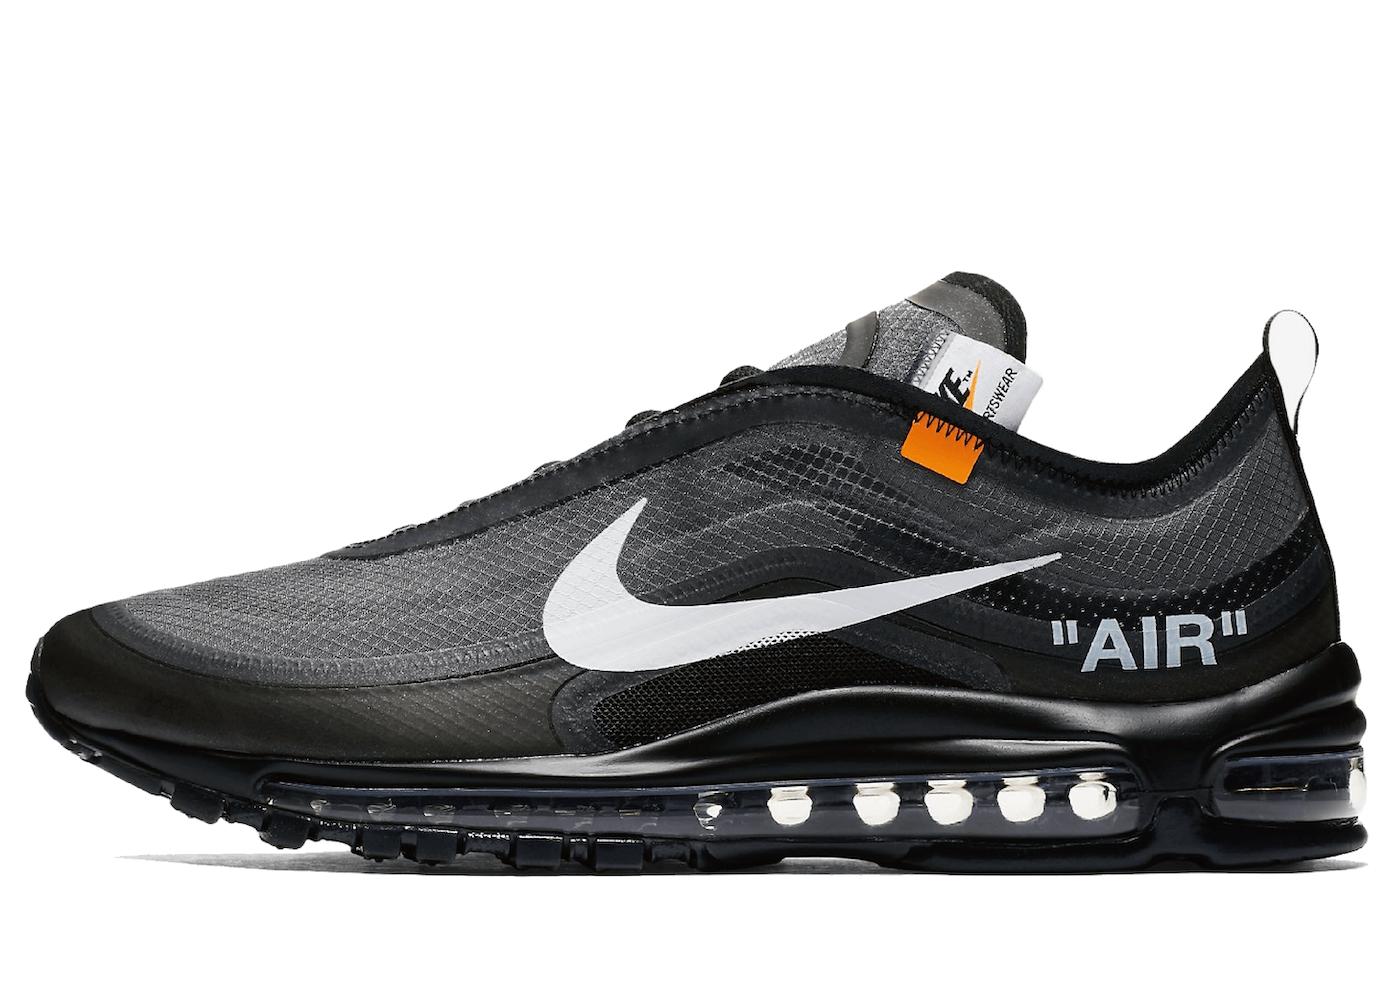 Off-White × Nike Air Max 97 Blackを安心